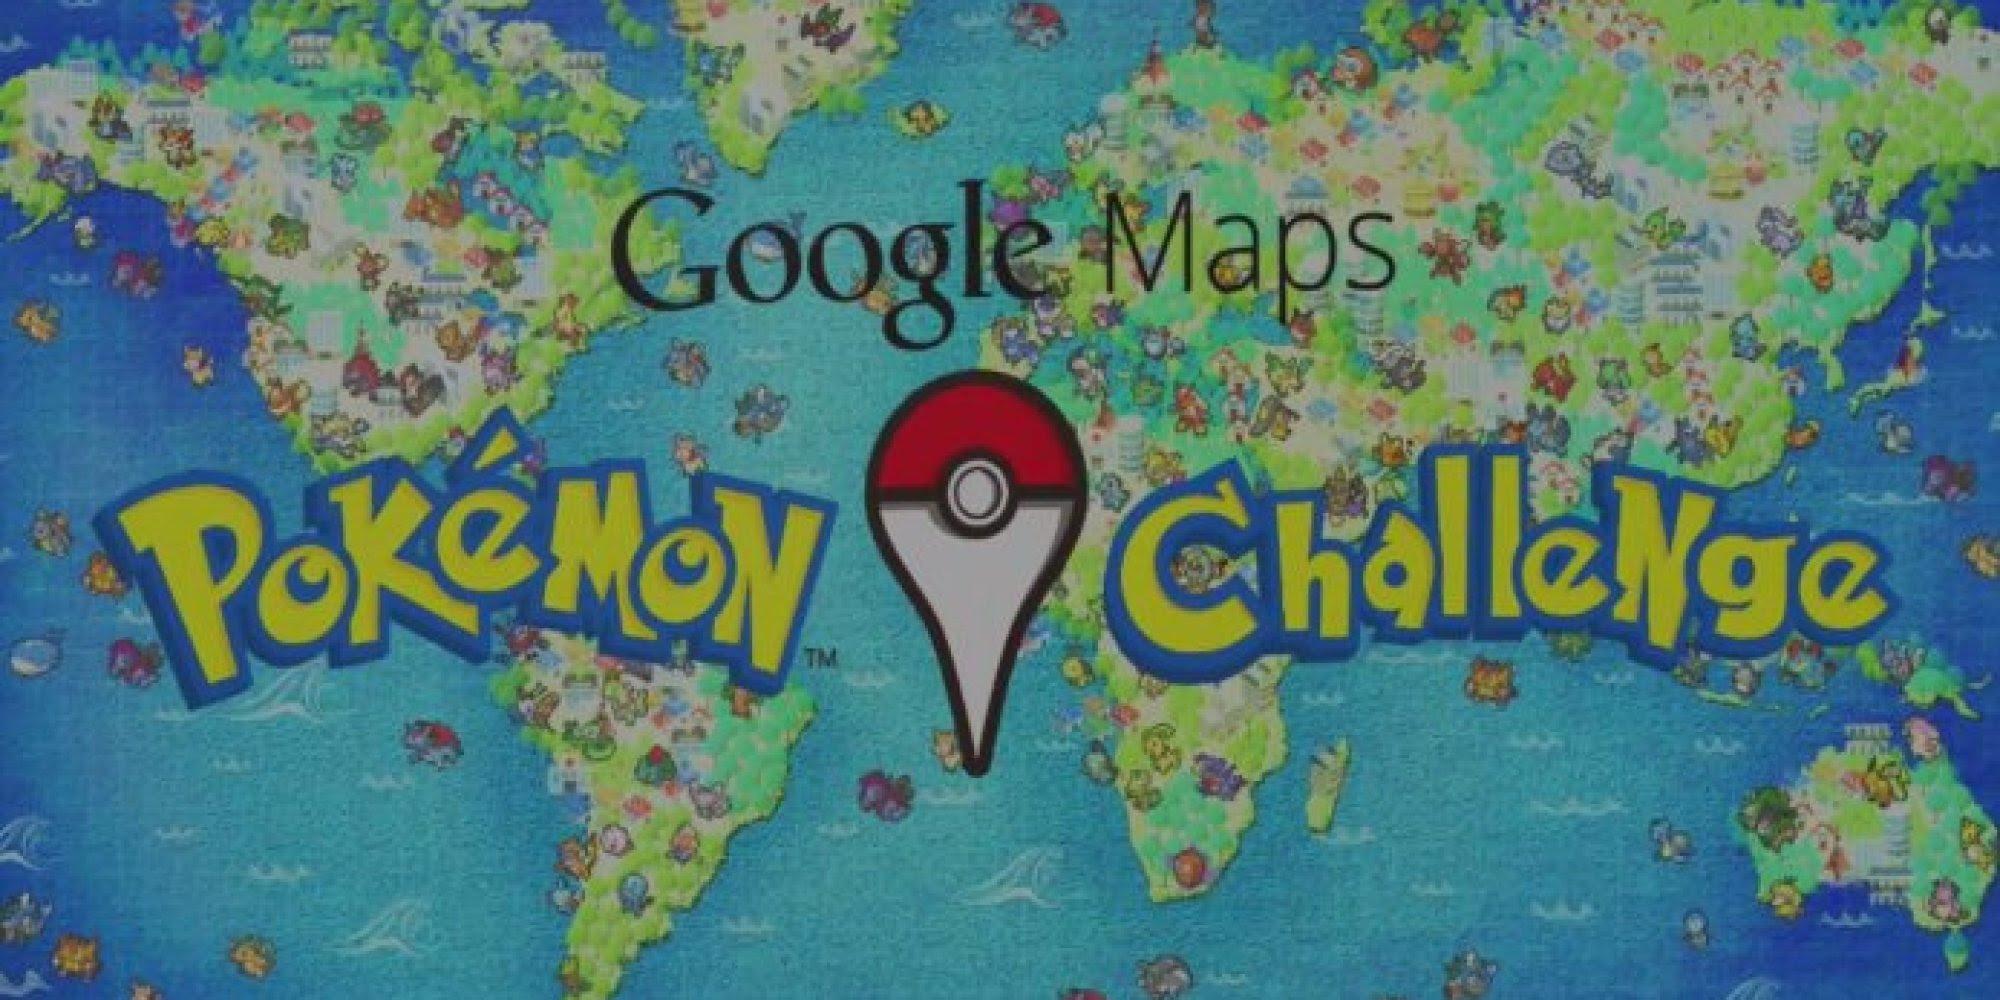 Google Maps Is Taken Over By Pokemon In April Fools Prank